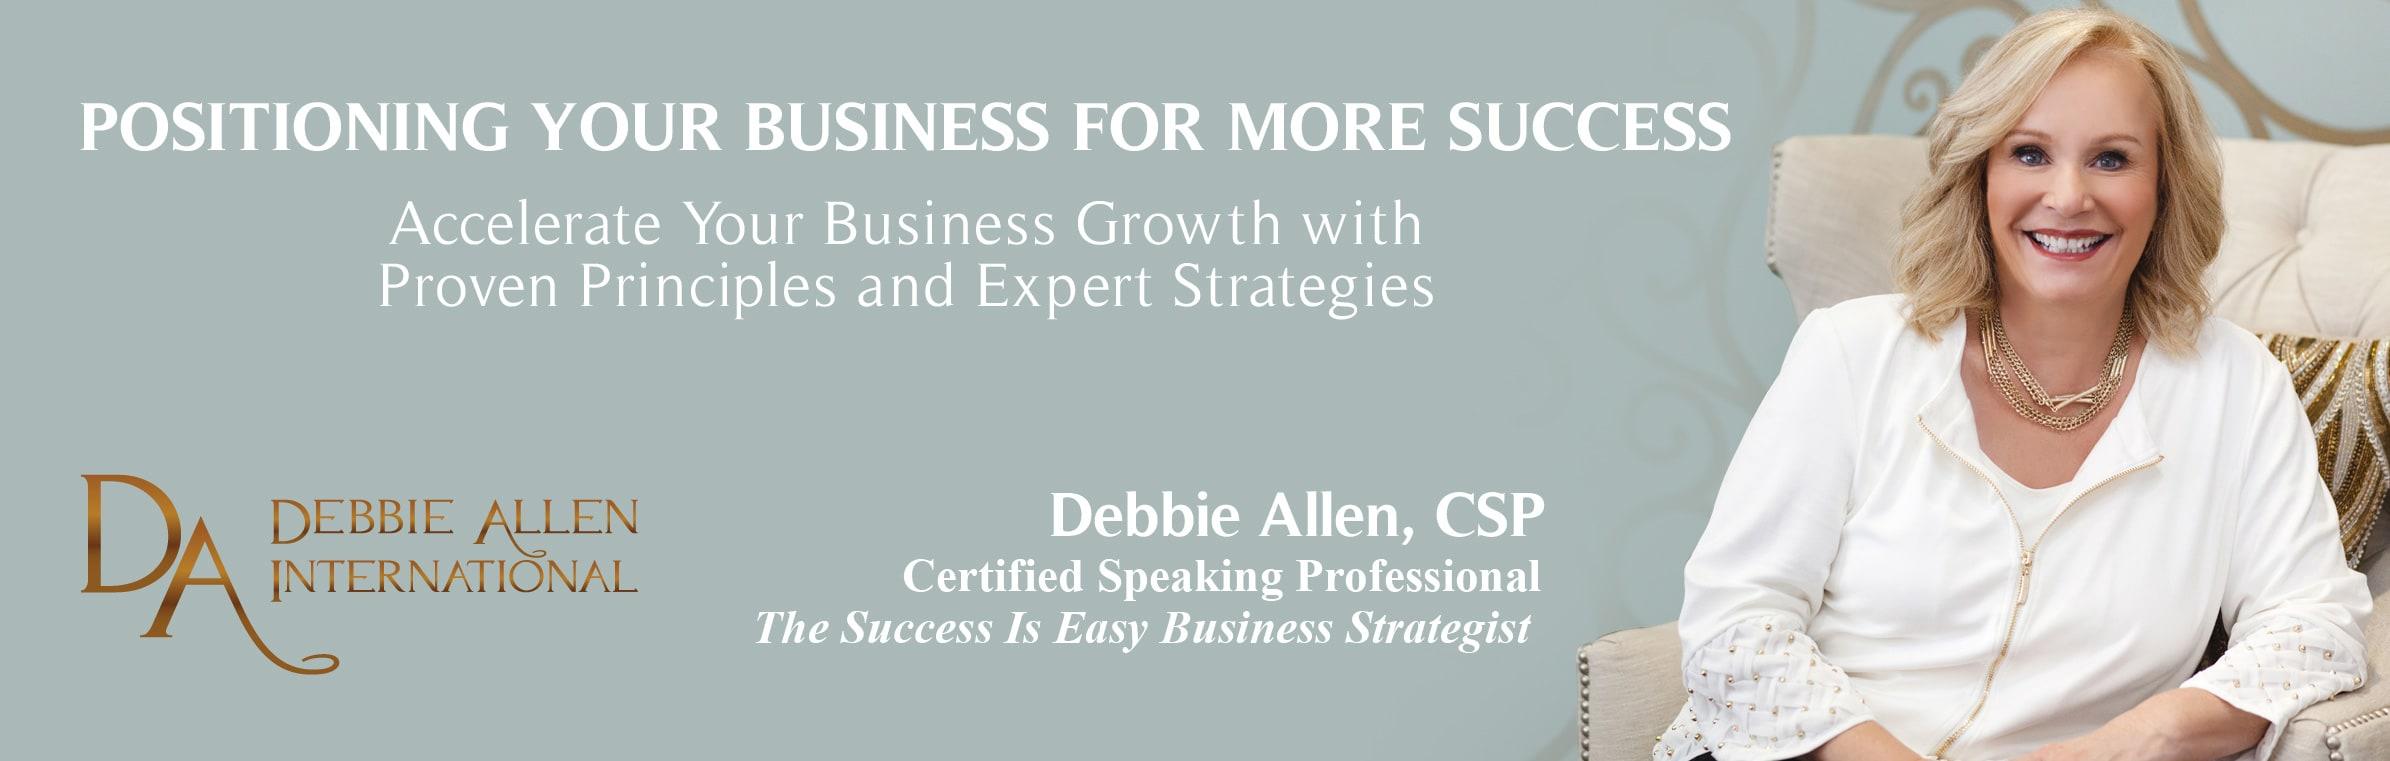 banner for Debbie Allen